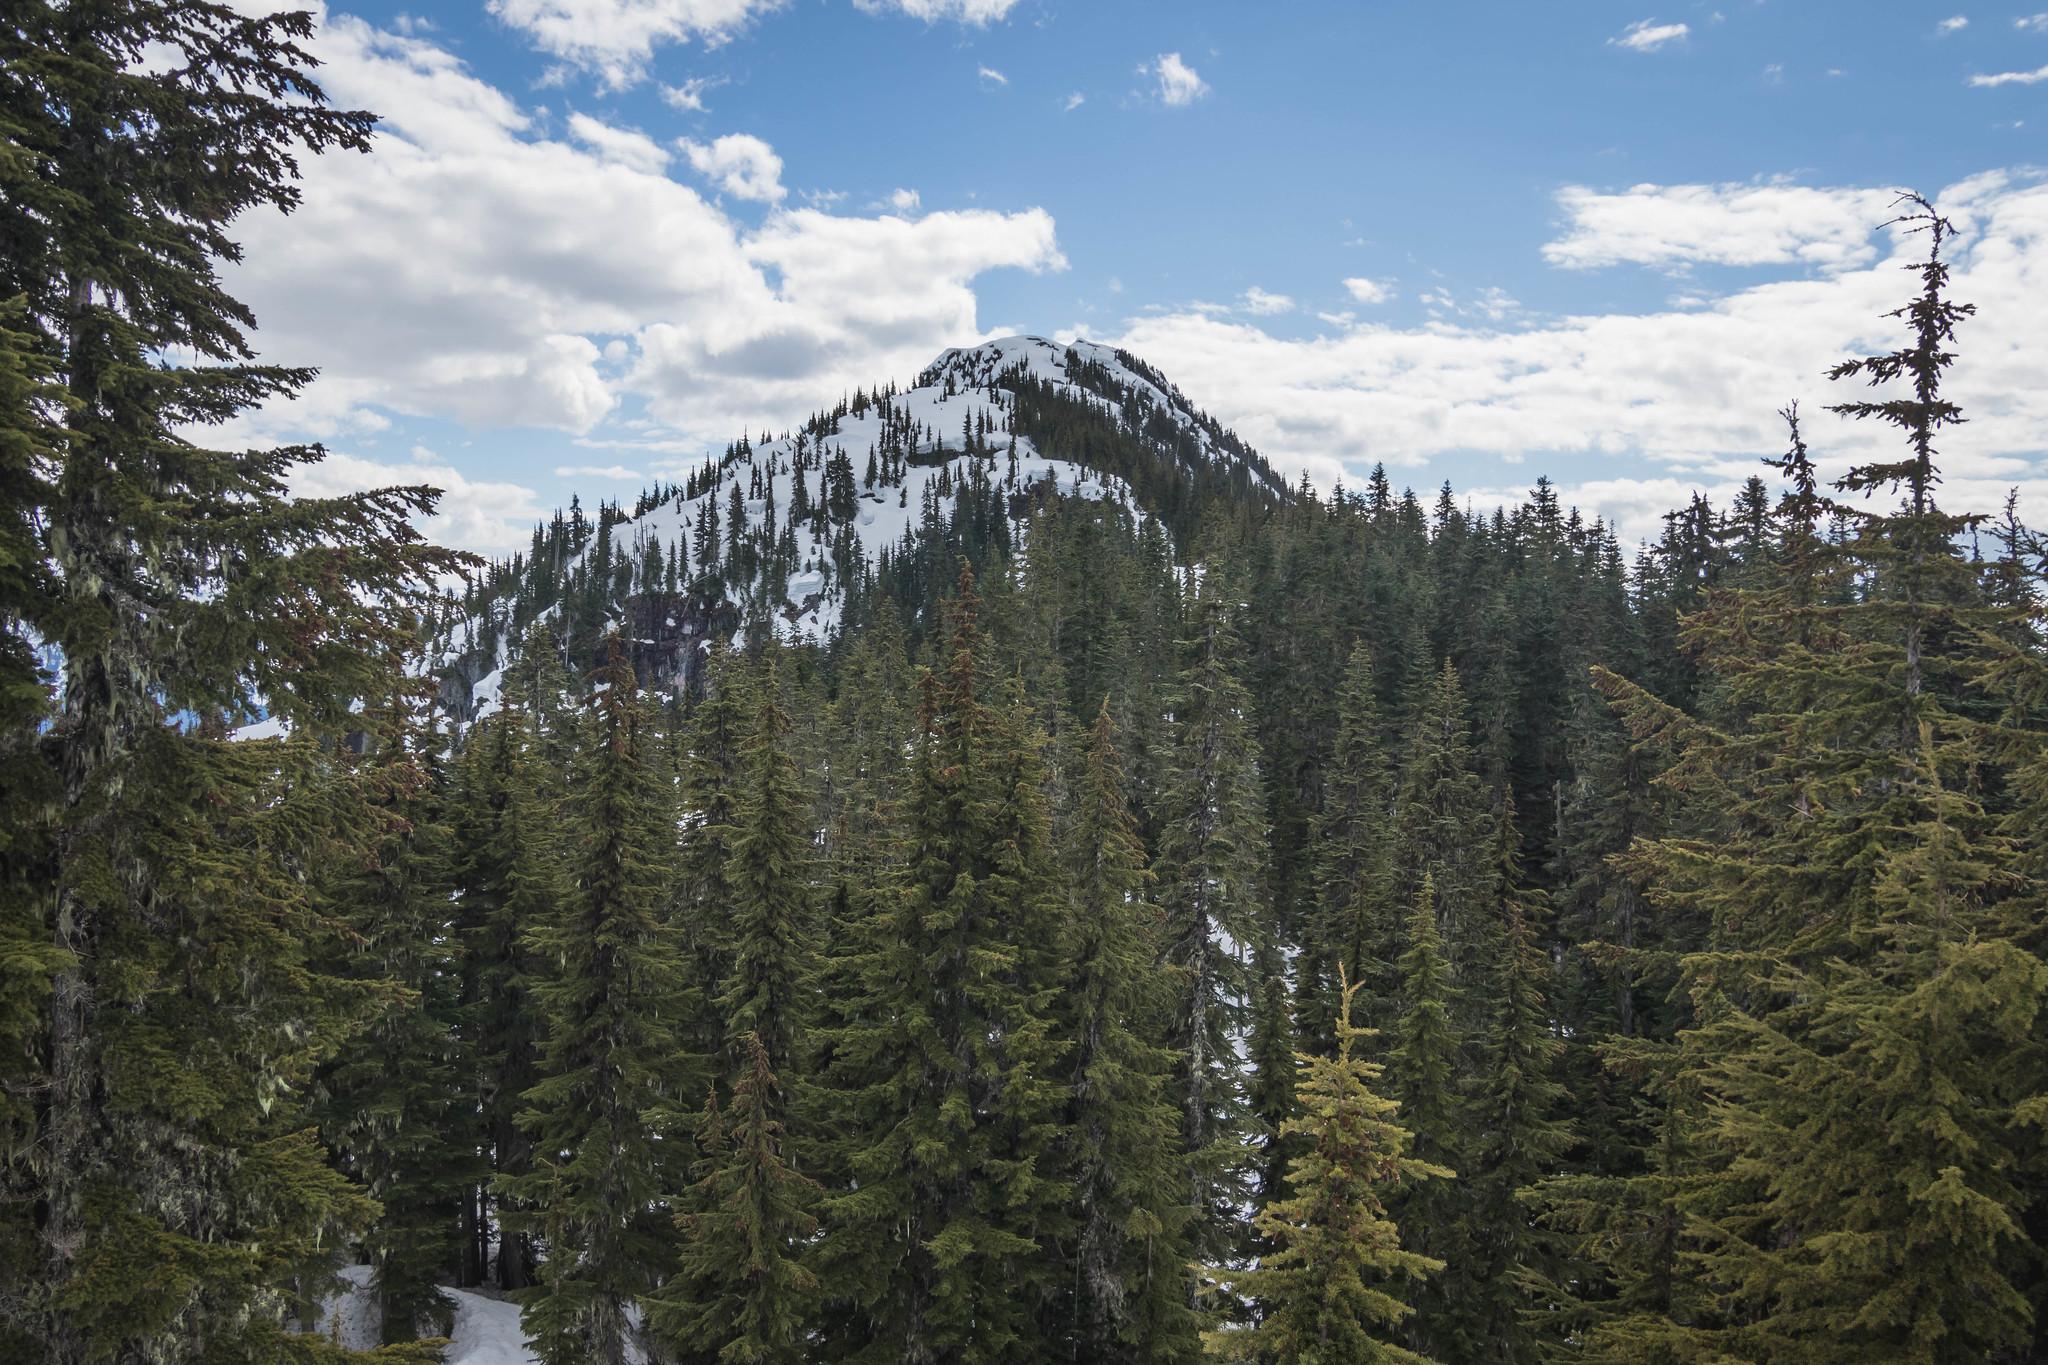 Oakes Peak from the ridge